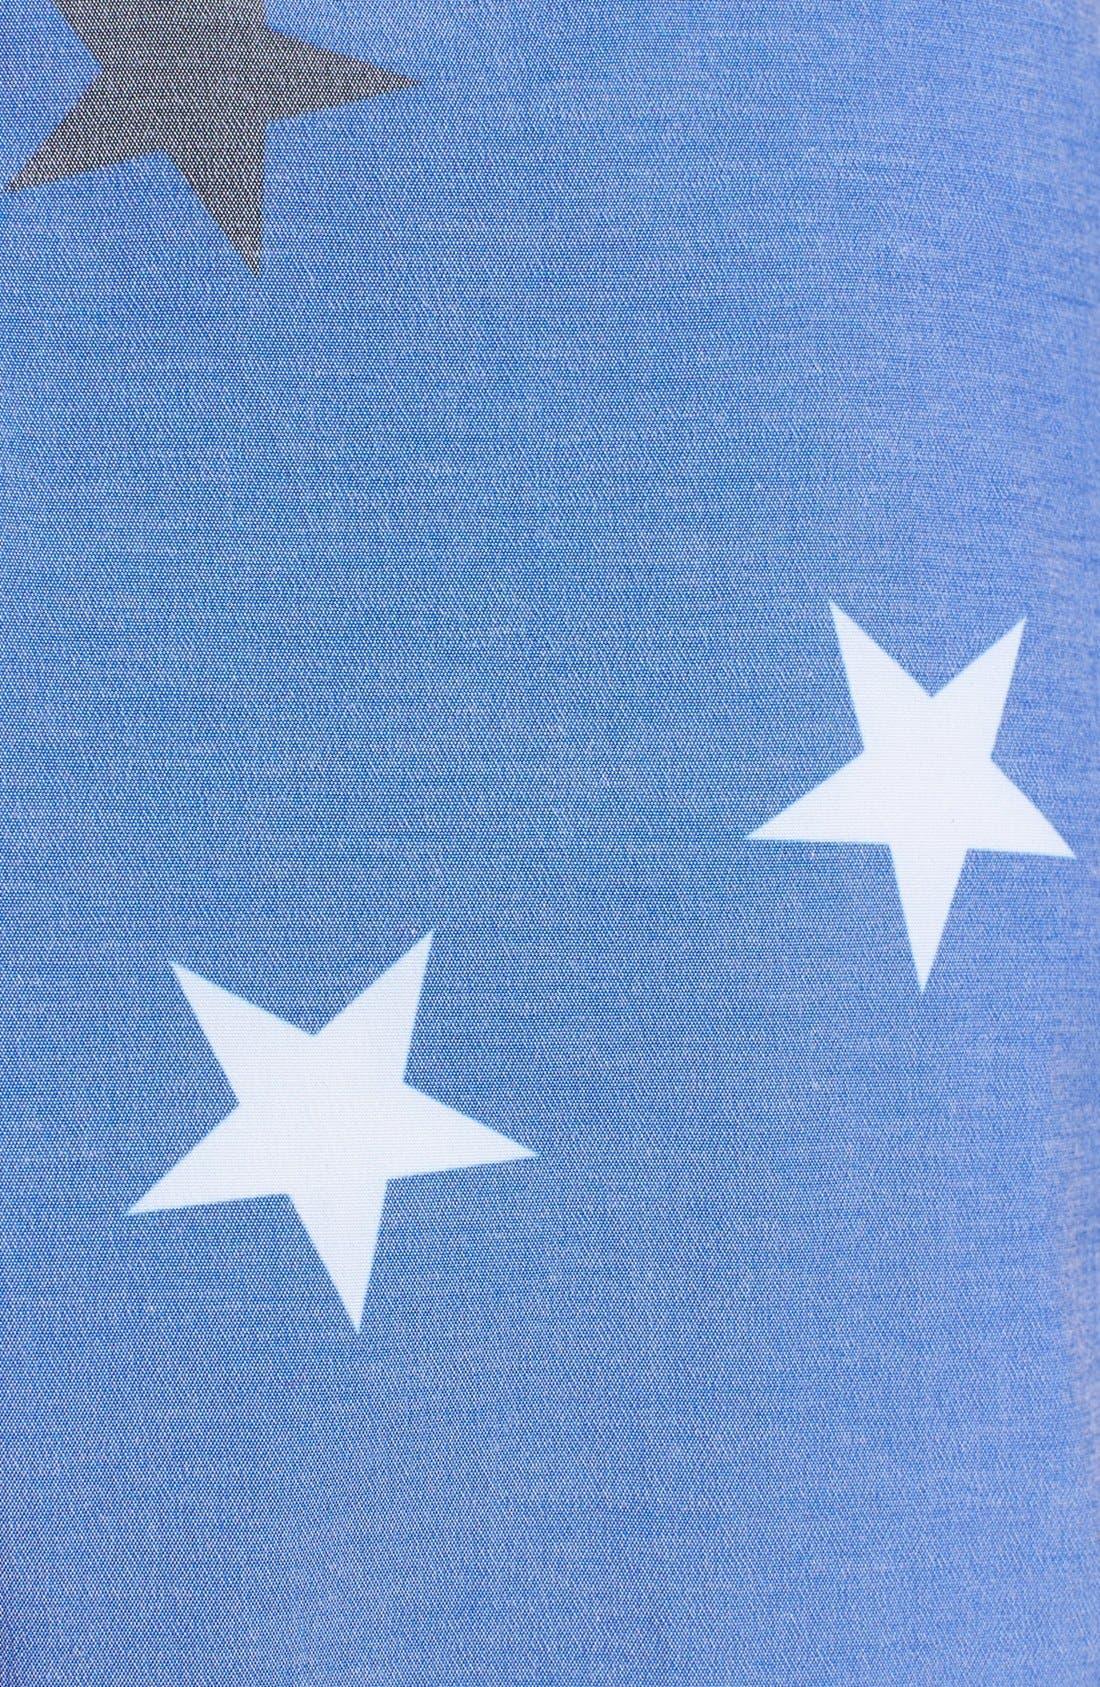 Alternate Image 3  - Quiksilver 'OG Scallop' Print Board Shorts